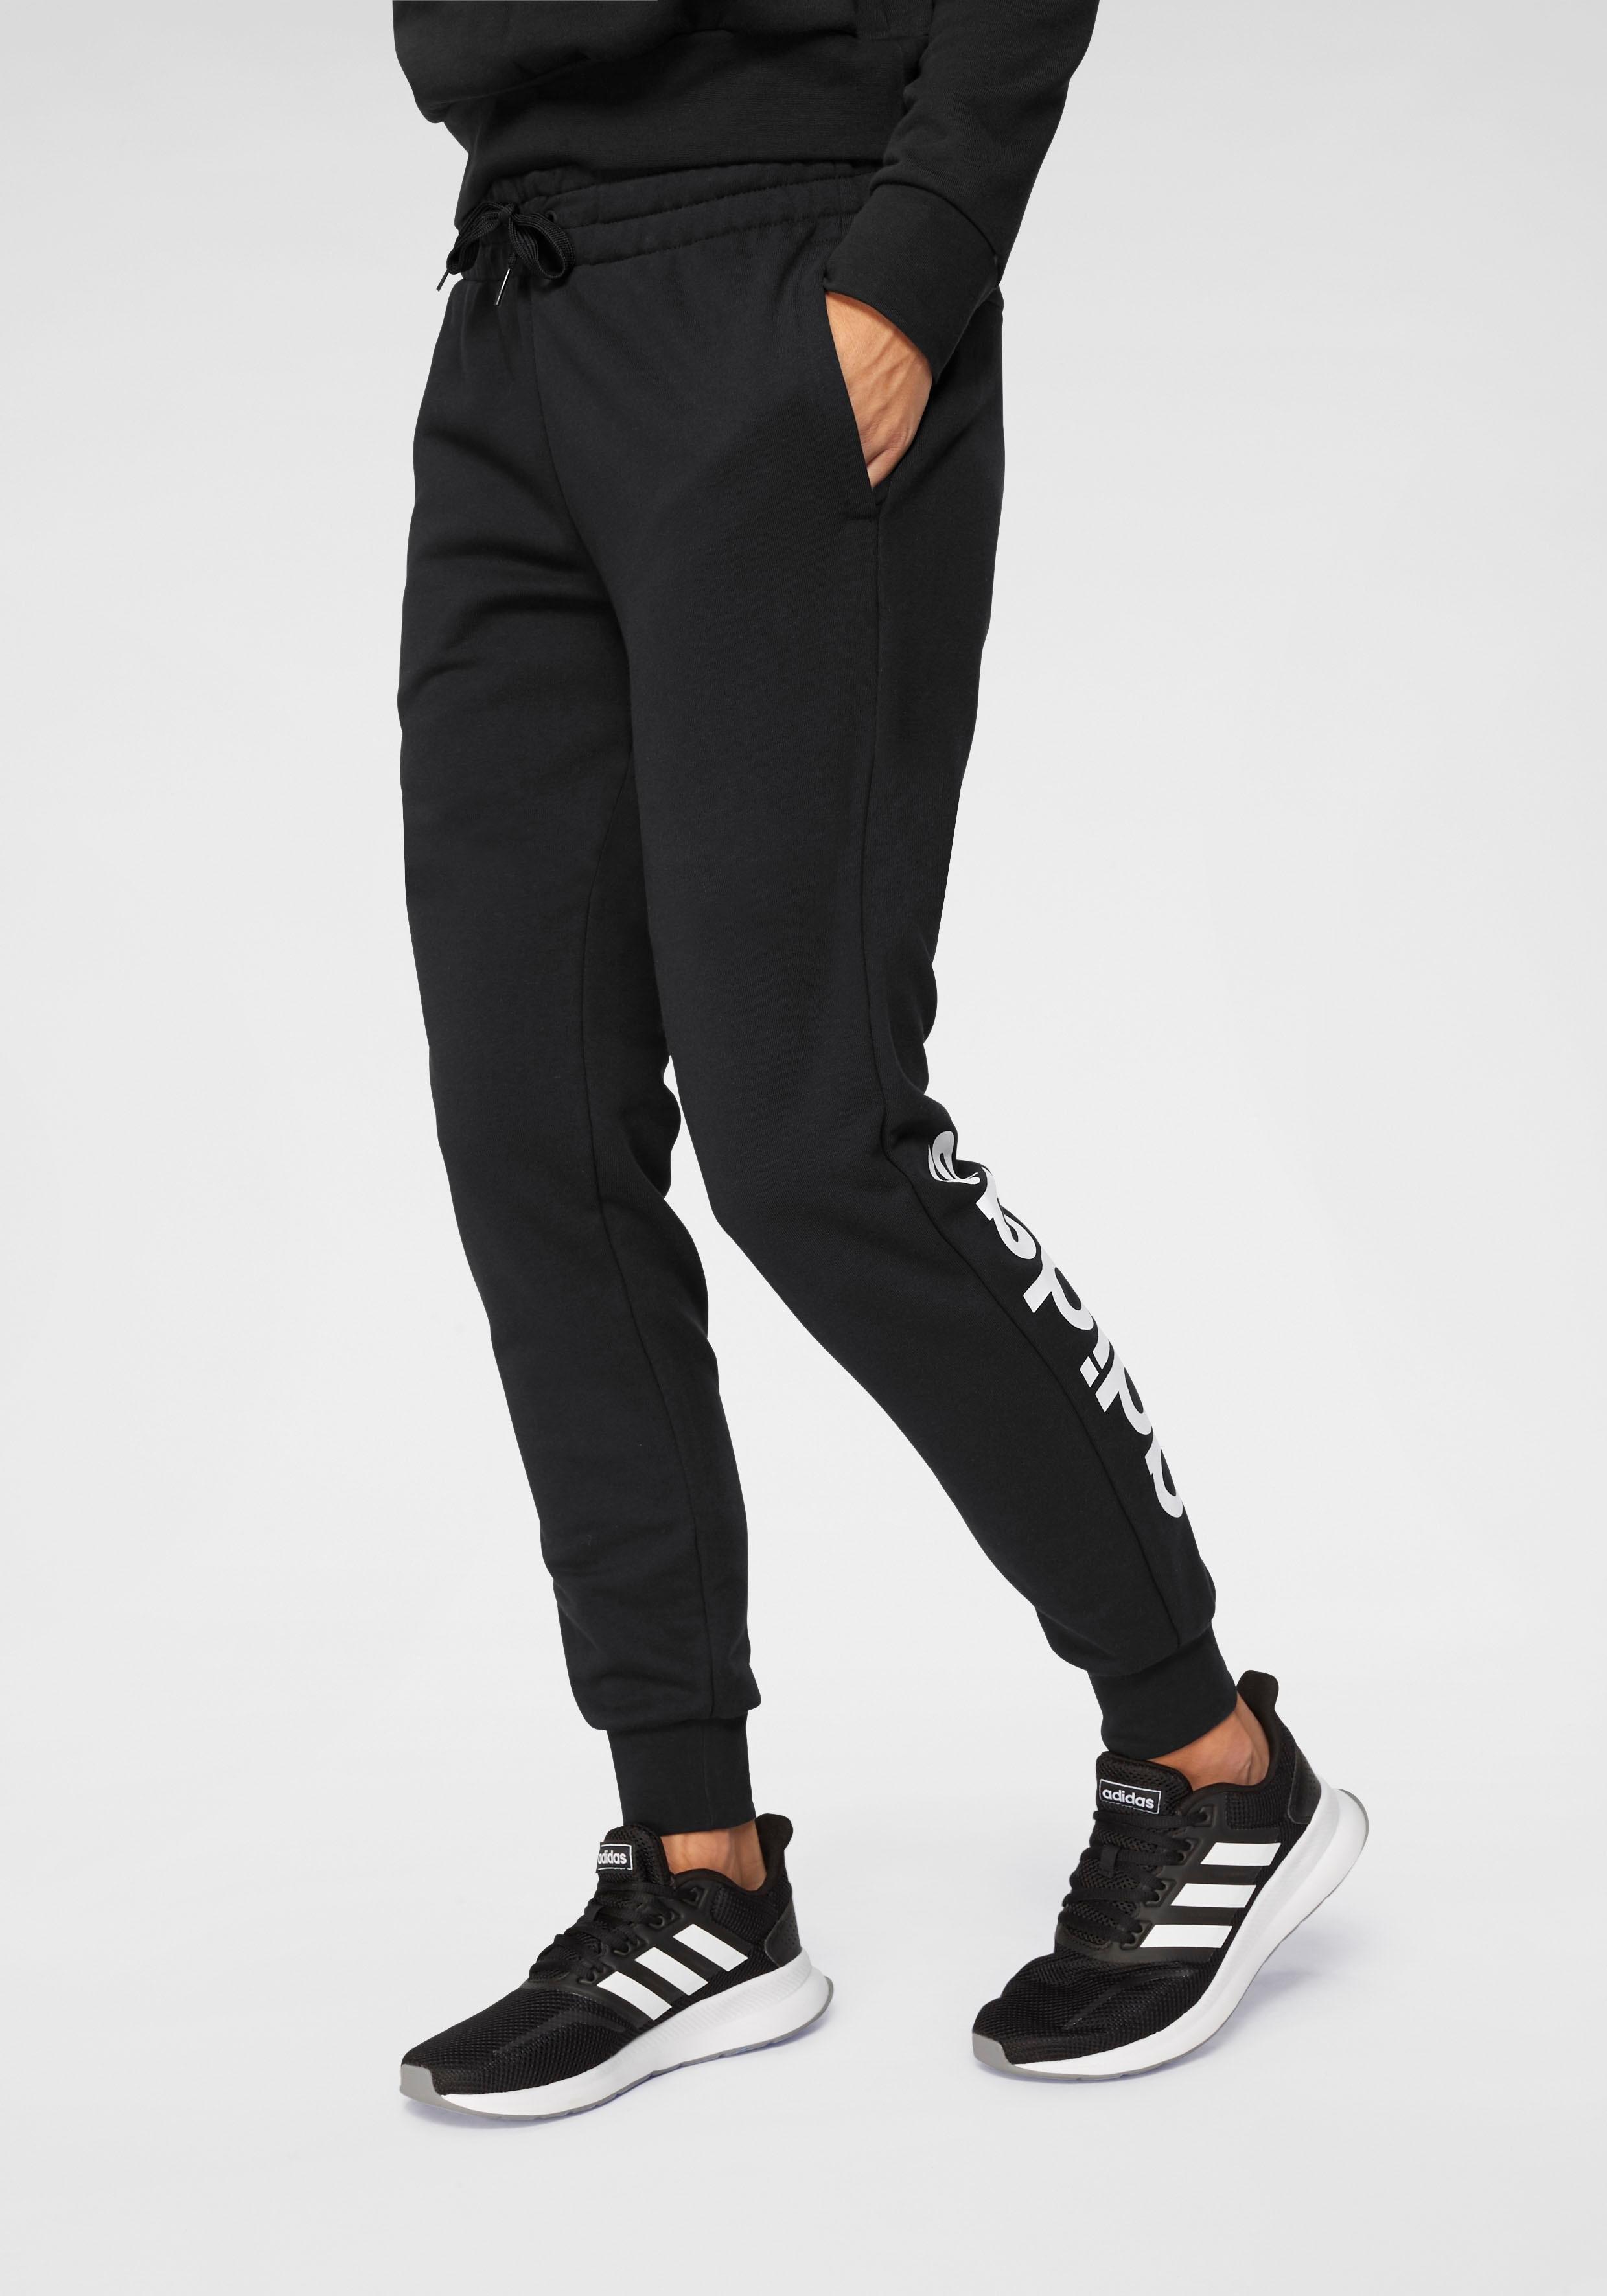 adidas Performance adidas joggingbroek »LINEAR PANT« nu online kopen bij OTTO